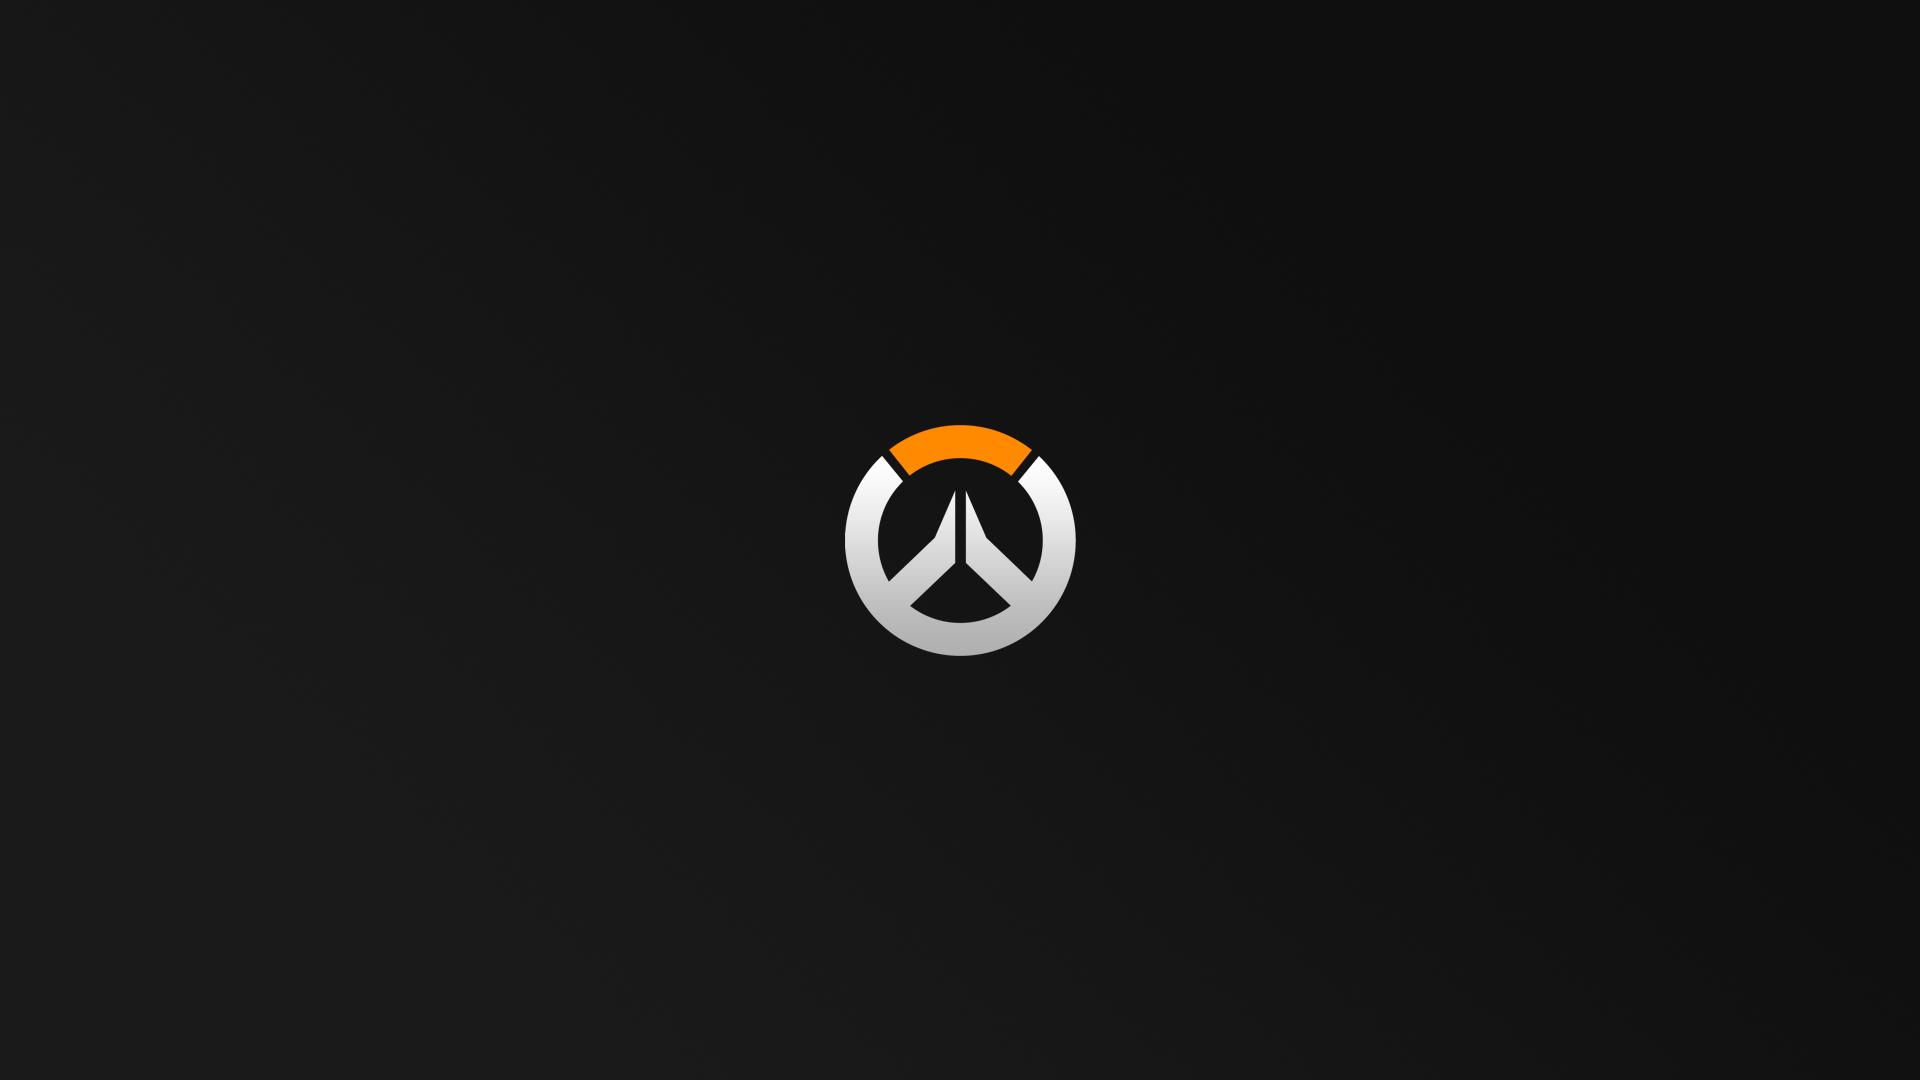 Overwatch Logo Wallpaper, HD Minimalist 4K Wallpapers ...